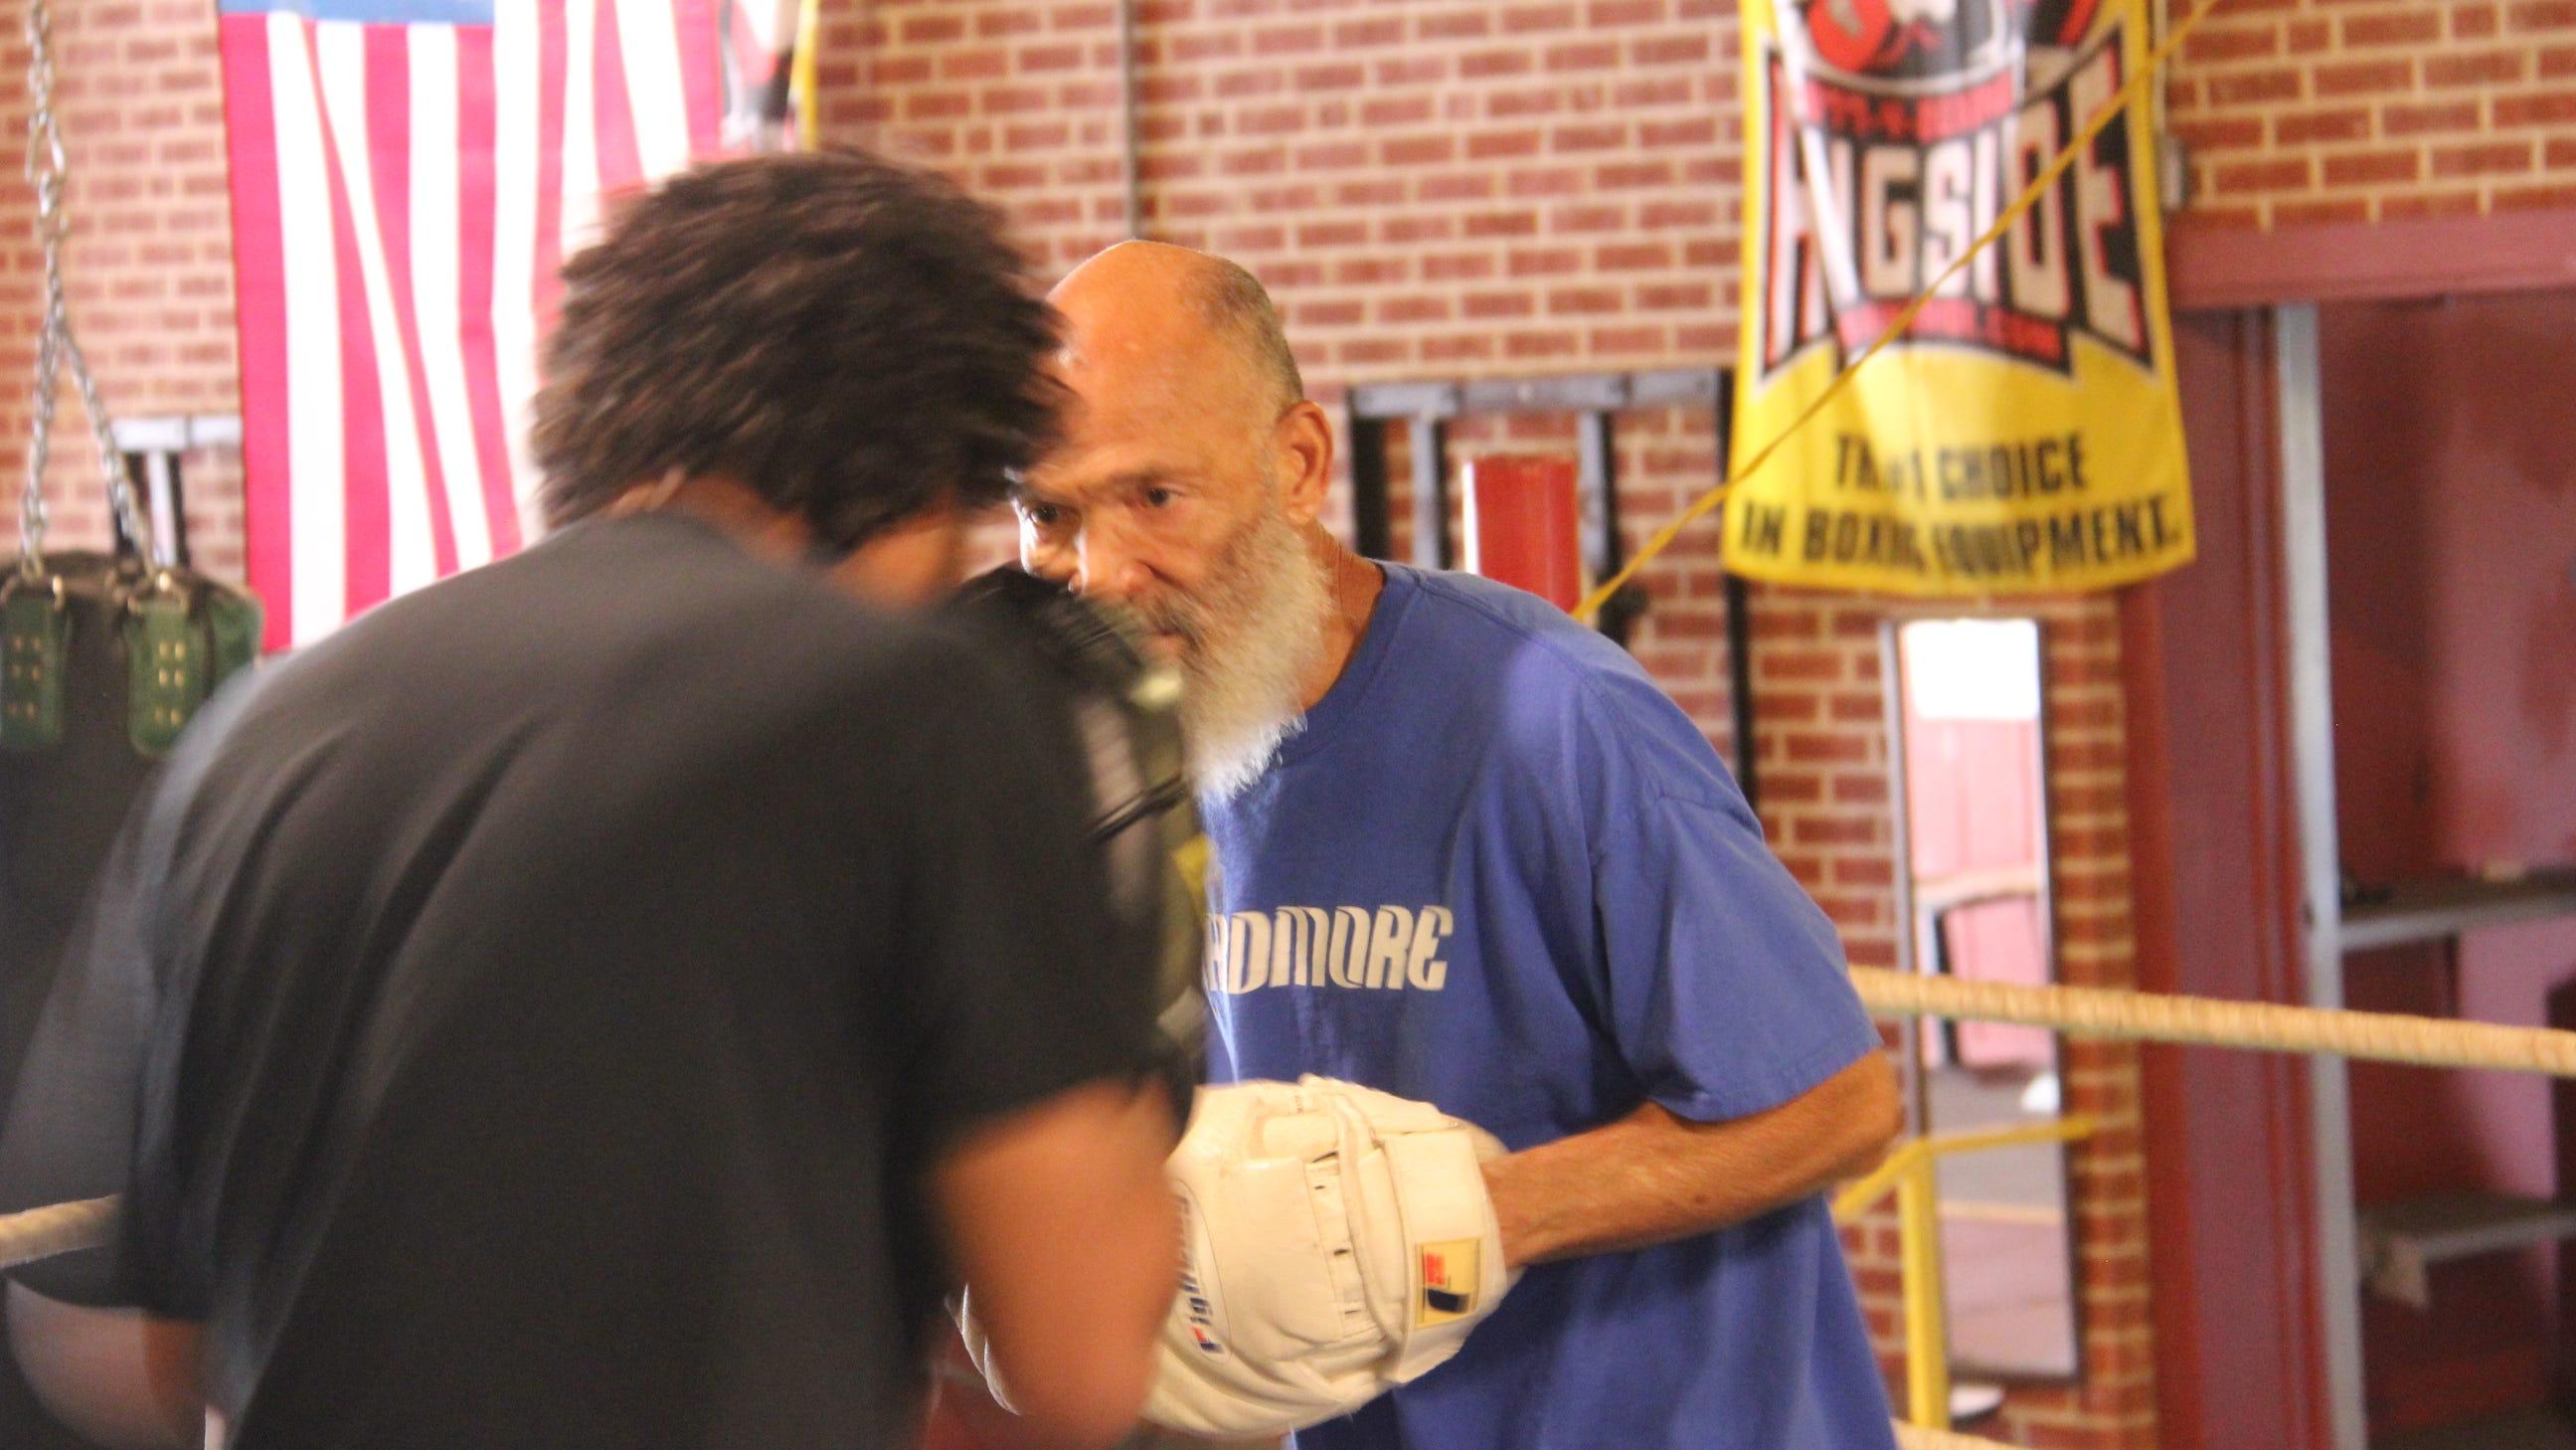 Garry Raymond instructs Kyler Hesterduring a recent training session.